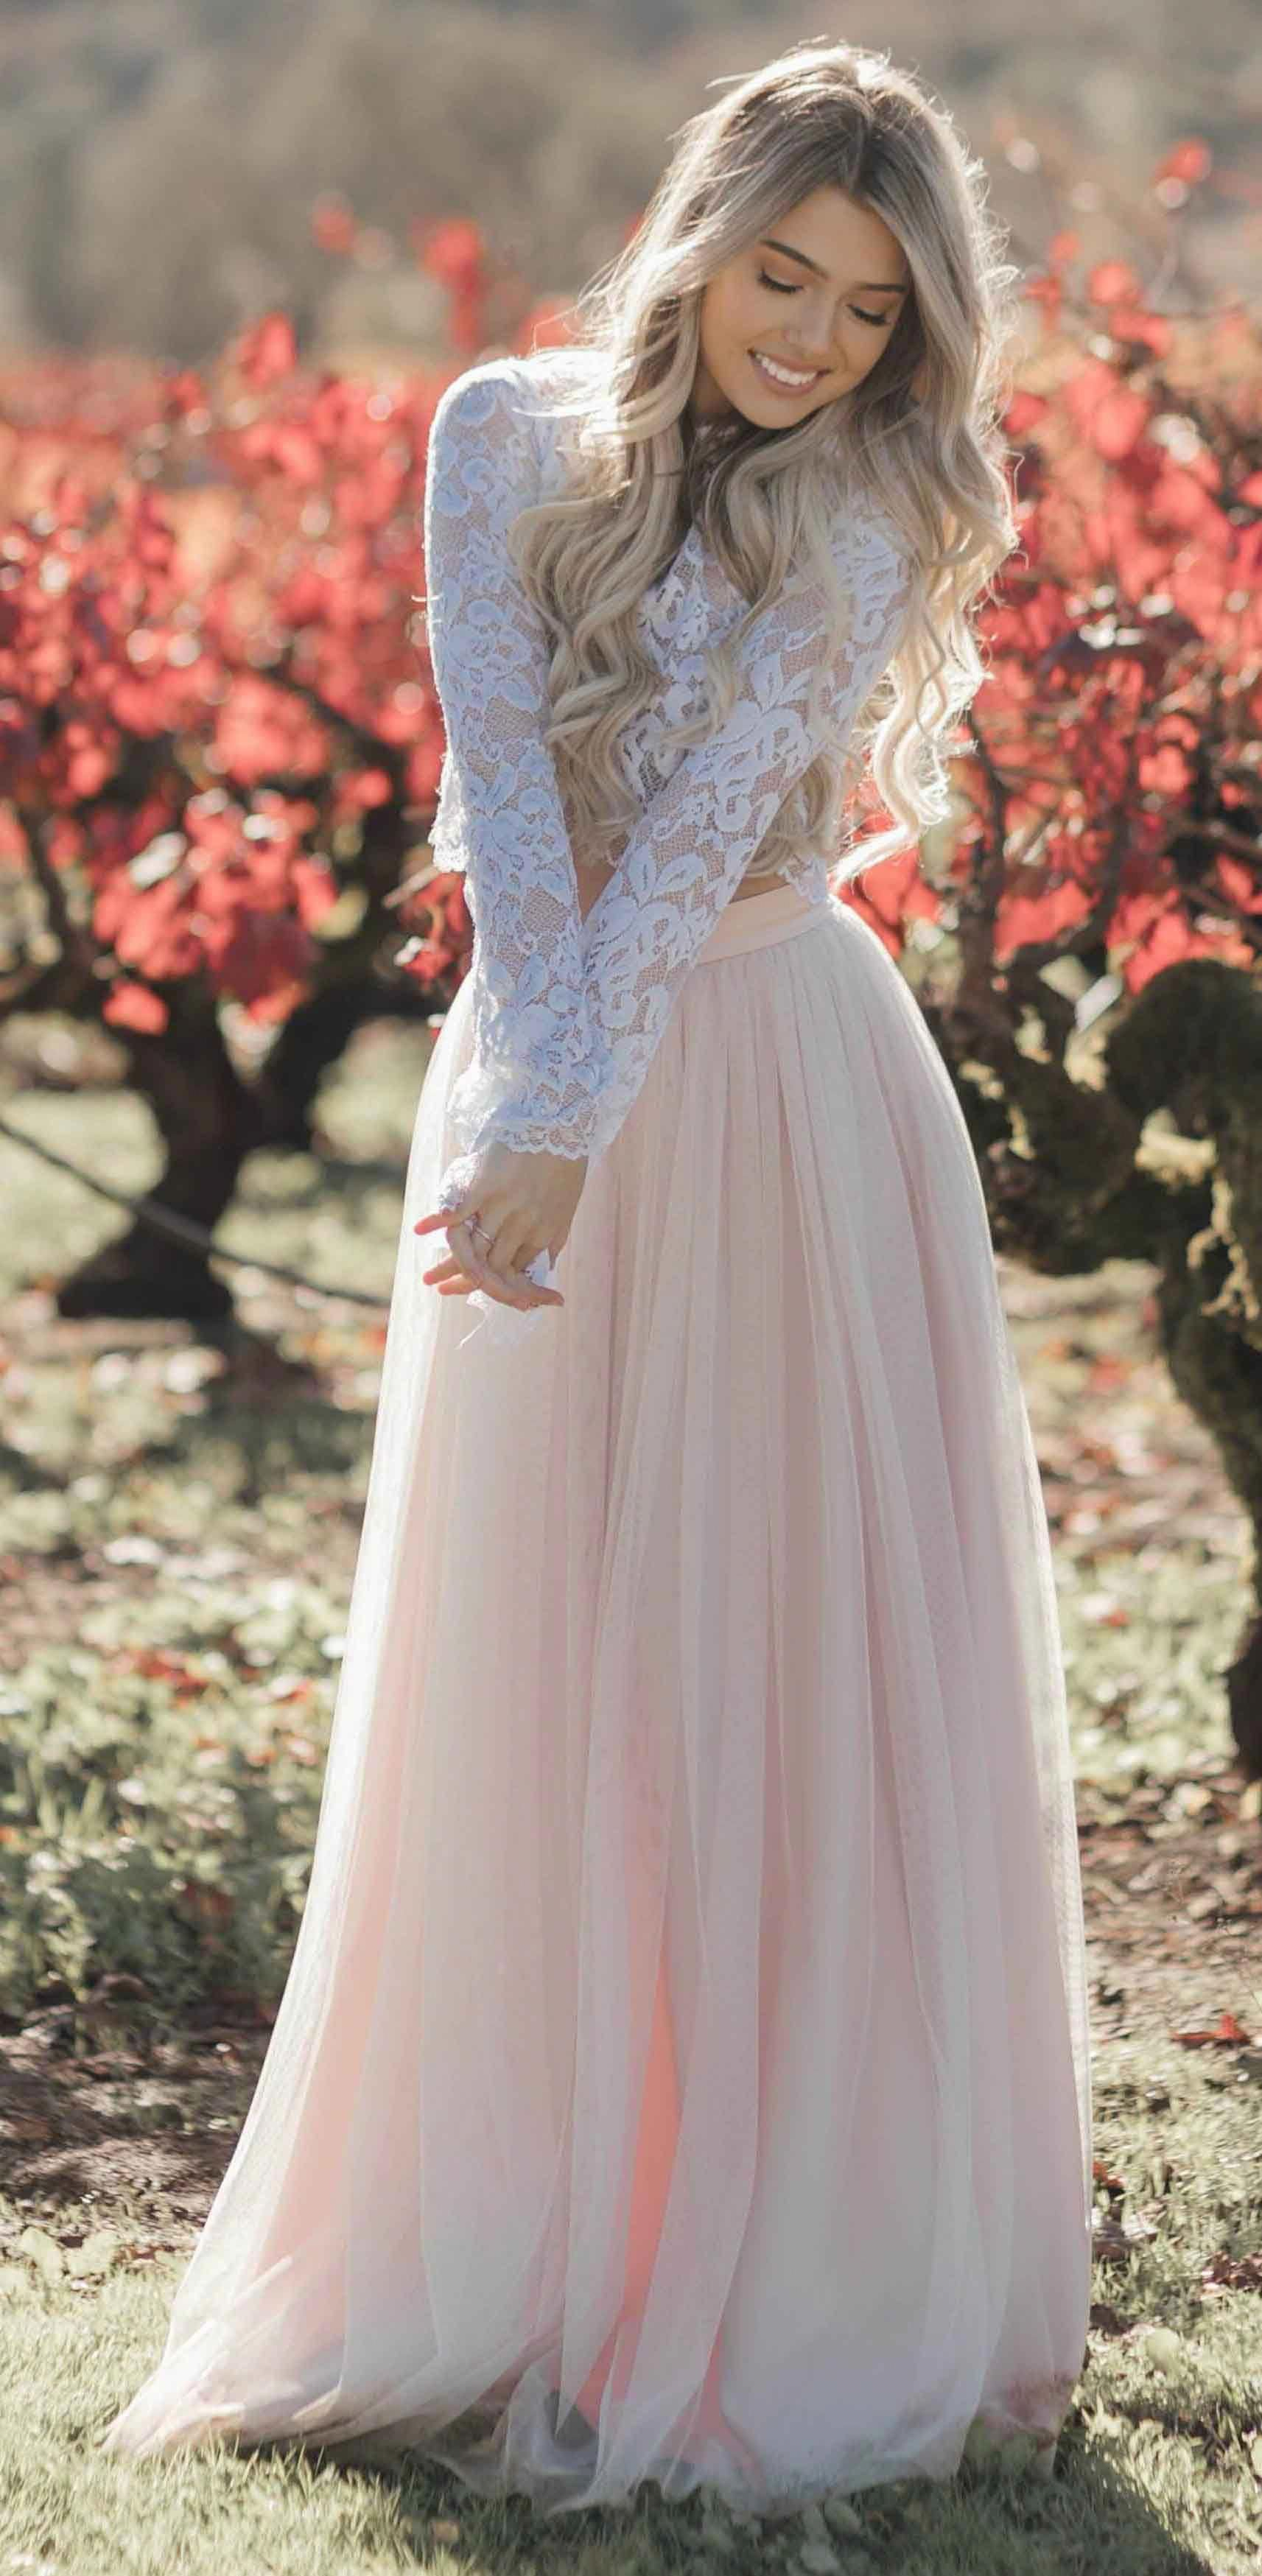 Blush Pink Wedding Dresses Country Weding Dresses Bohemian Wedding Dress Rust Long Sleeve Wedding Dress Lace Blush Wedding Dress Lace Beach Wedding Dress Boho